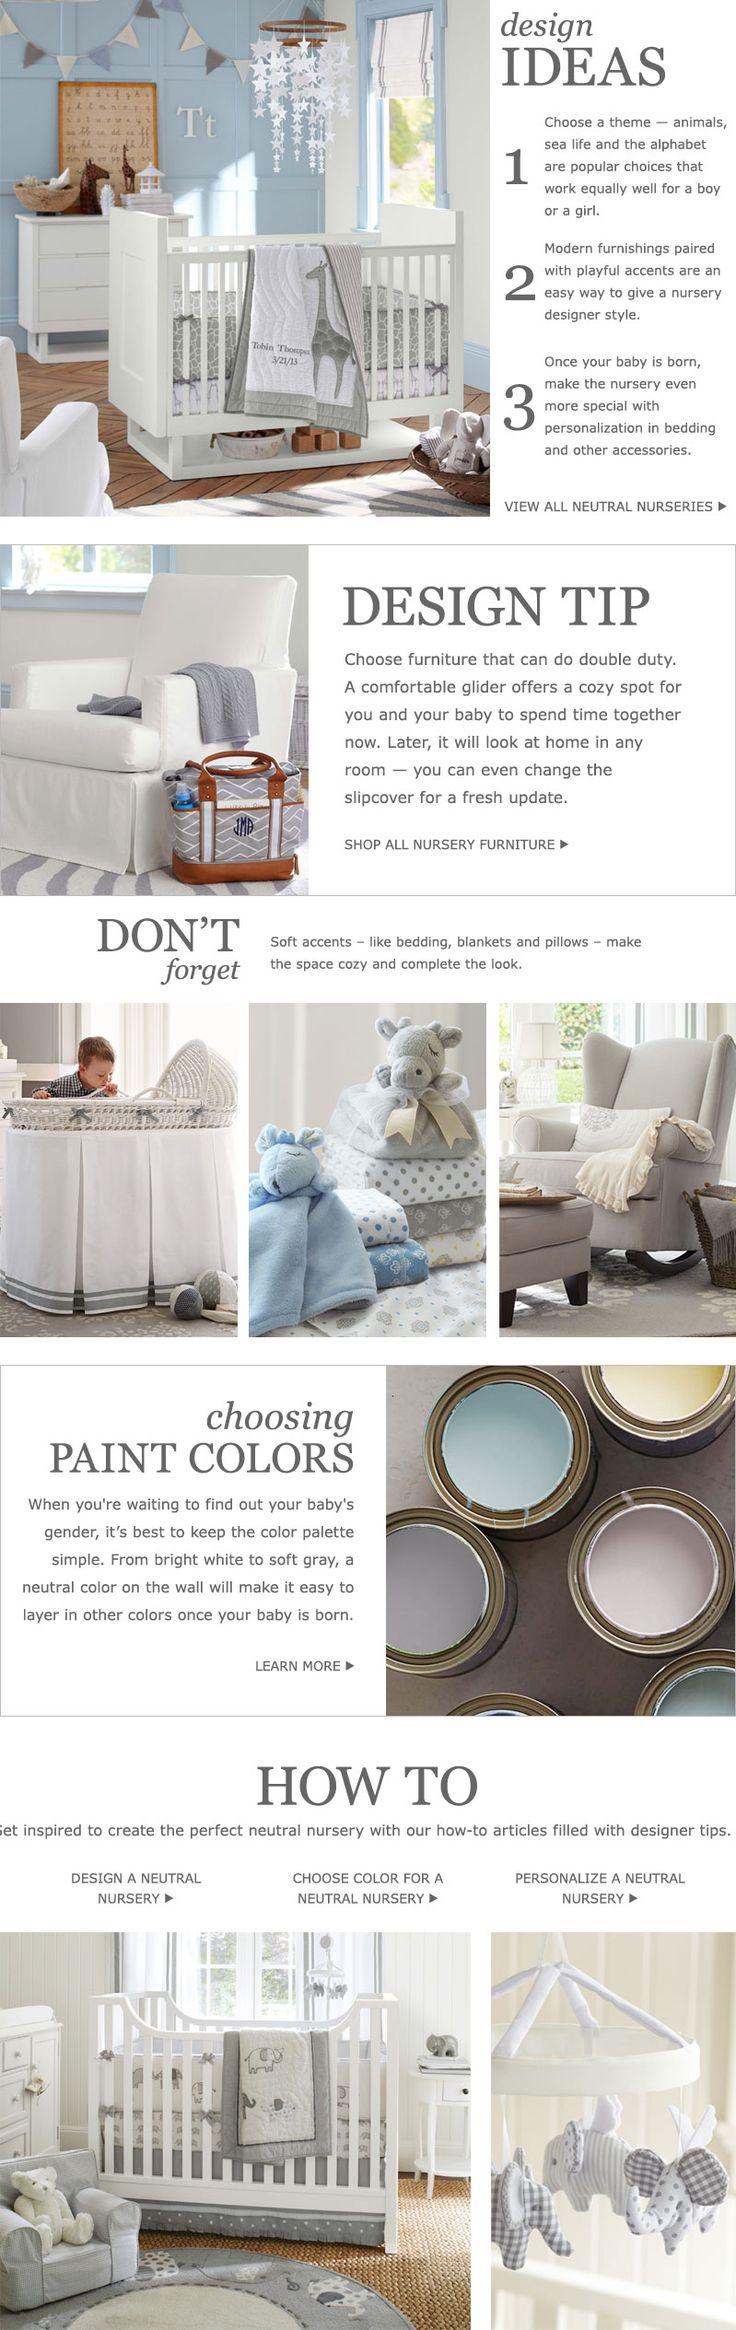 "FPP:""Baby Nursery Themes & Nursery Design | Pottery Barn Kids"" keep it neutral"